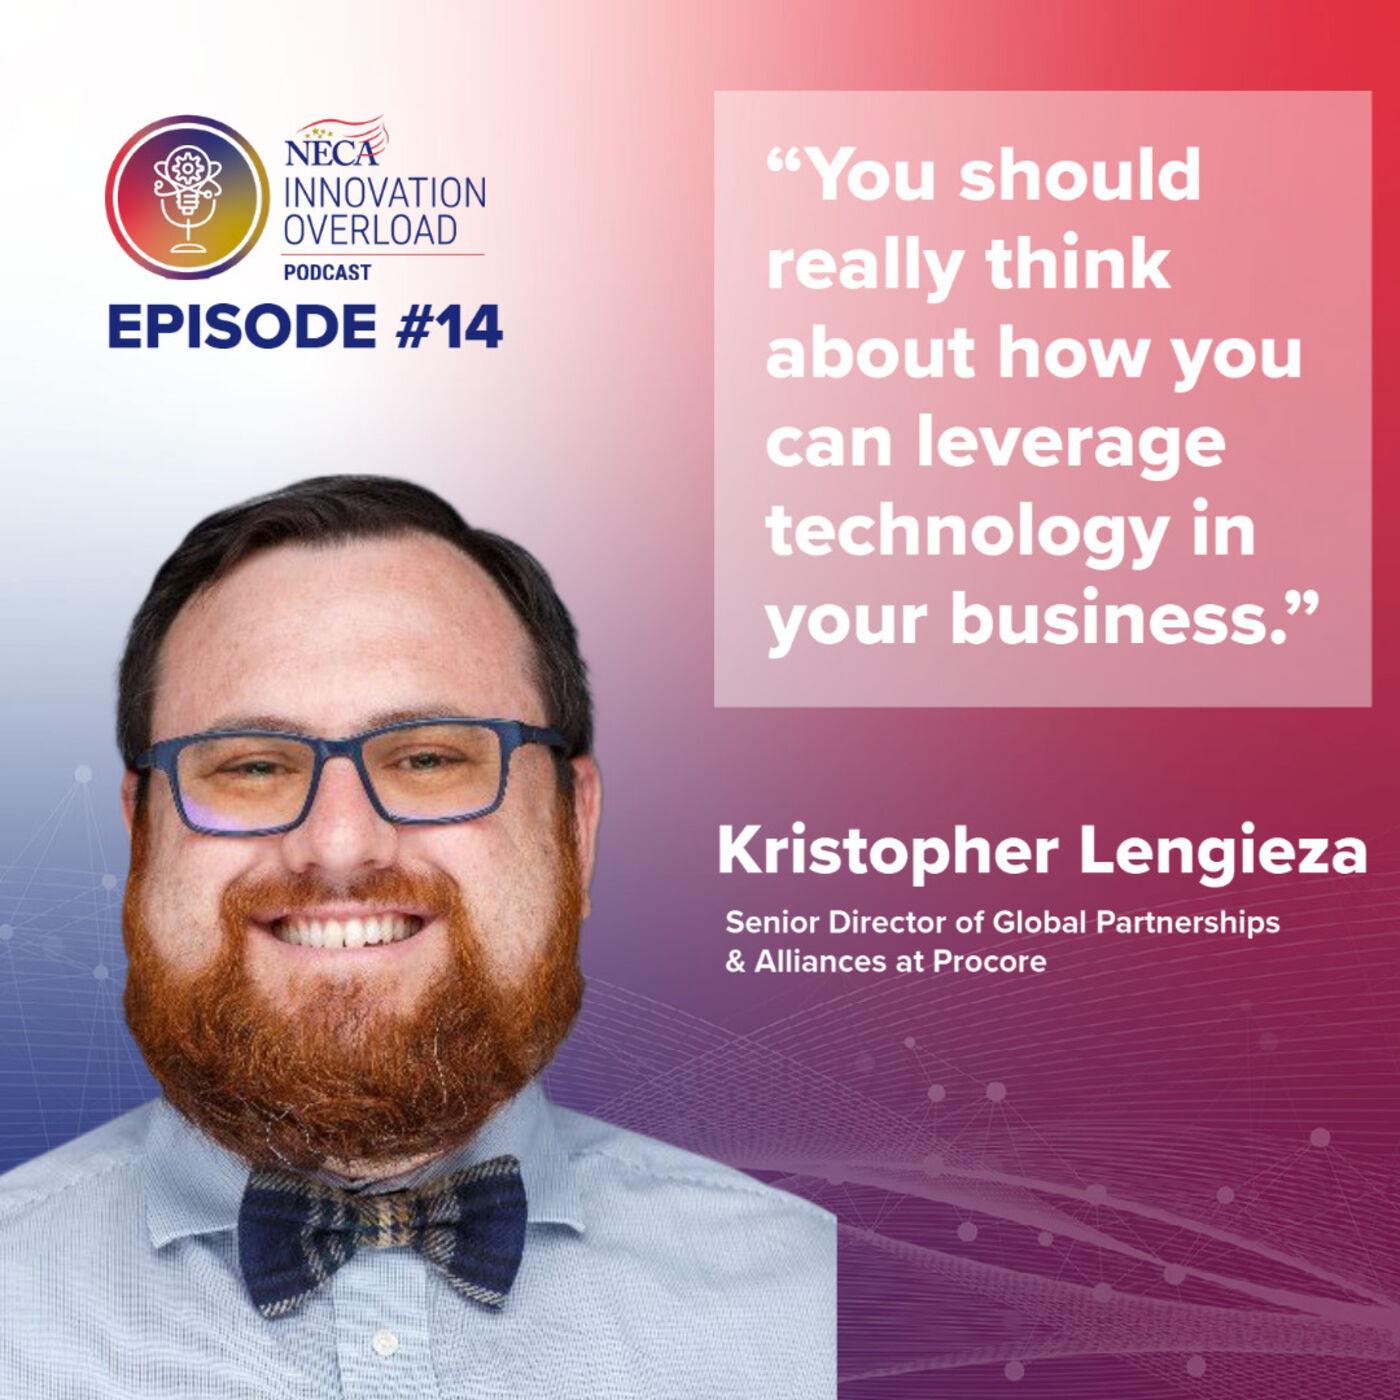 #14 - Kristopher Lengieza